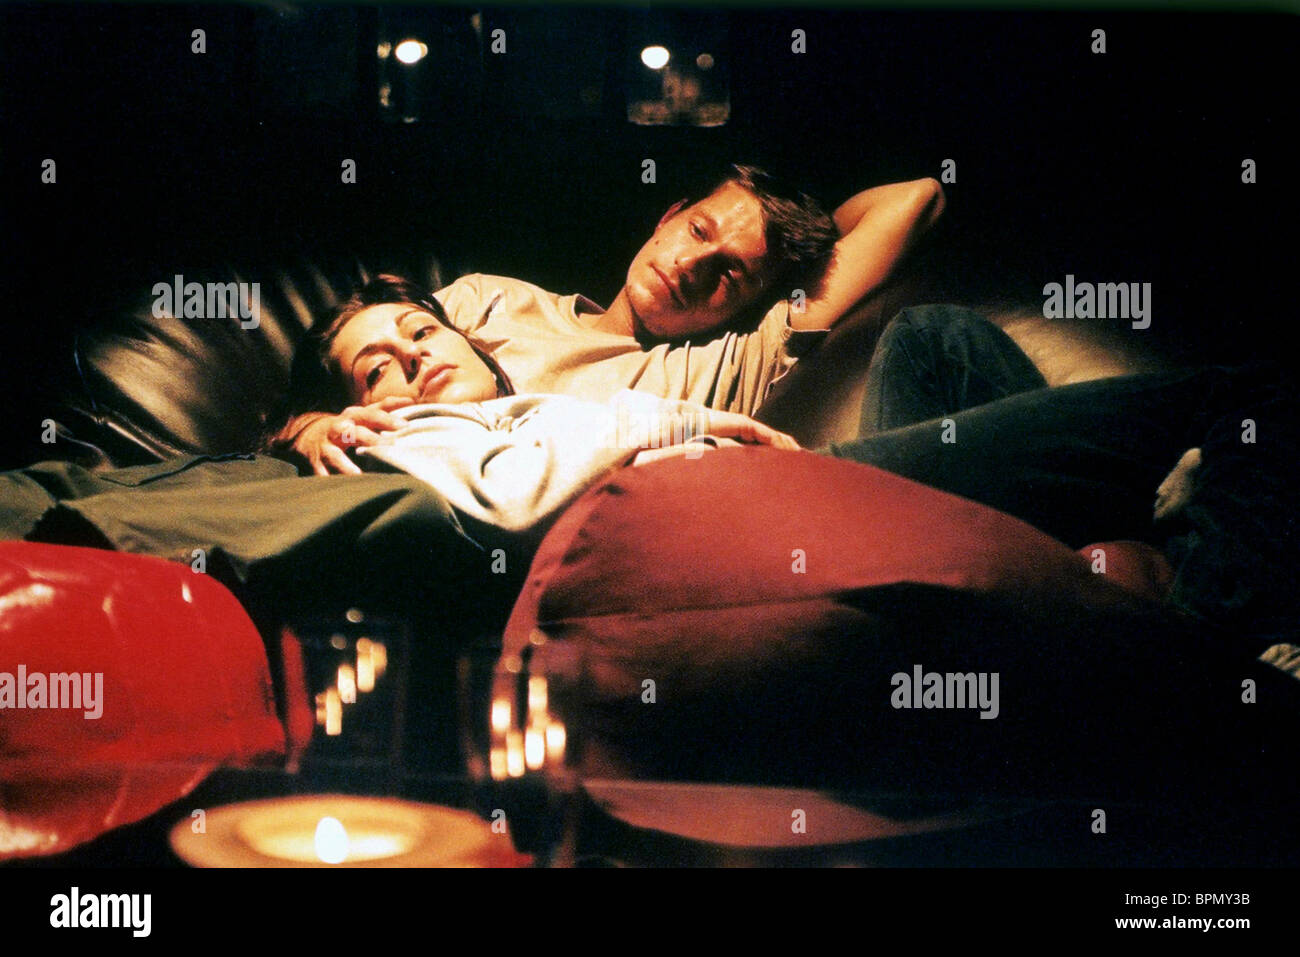 SUMMER PHOENIX & LEO GREGORY SUZIE GOLD (2004) - Stock Image